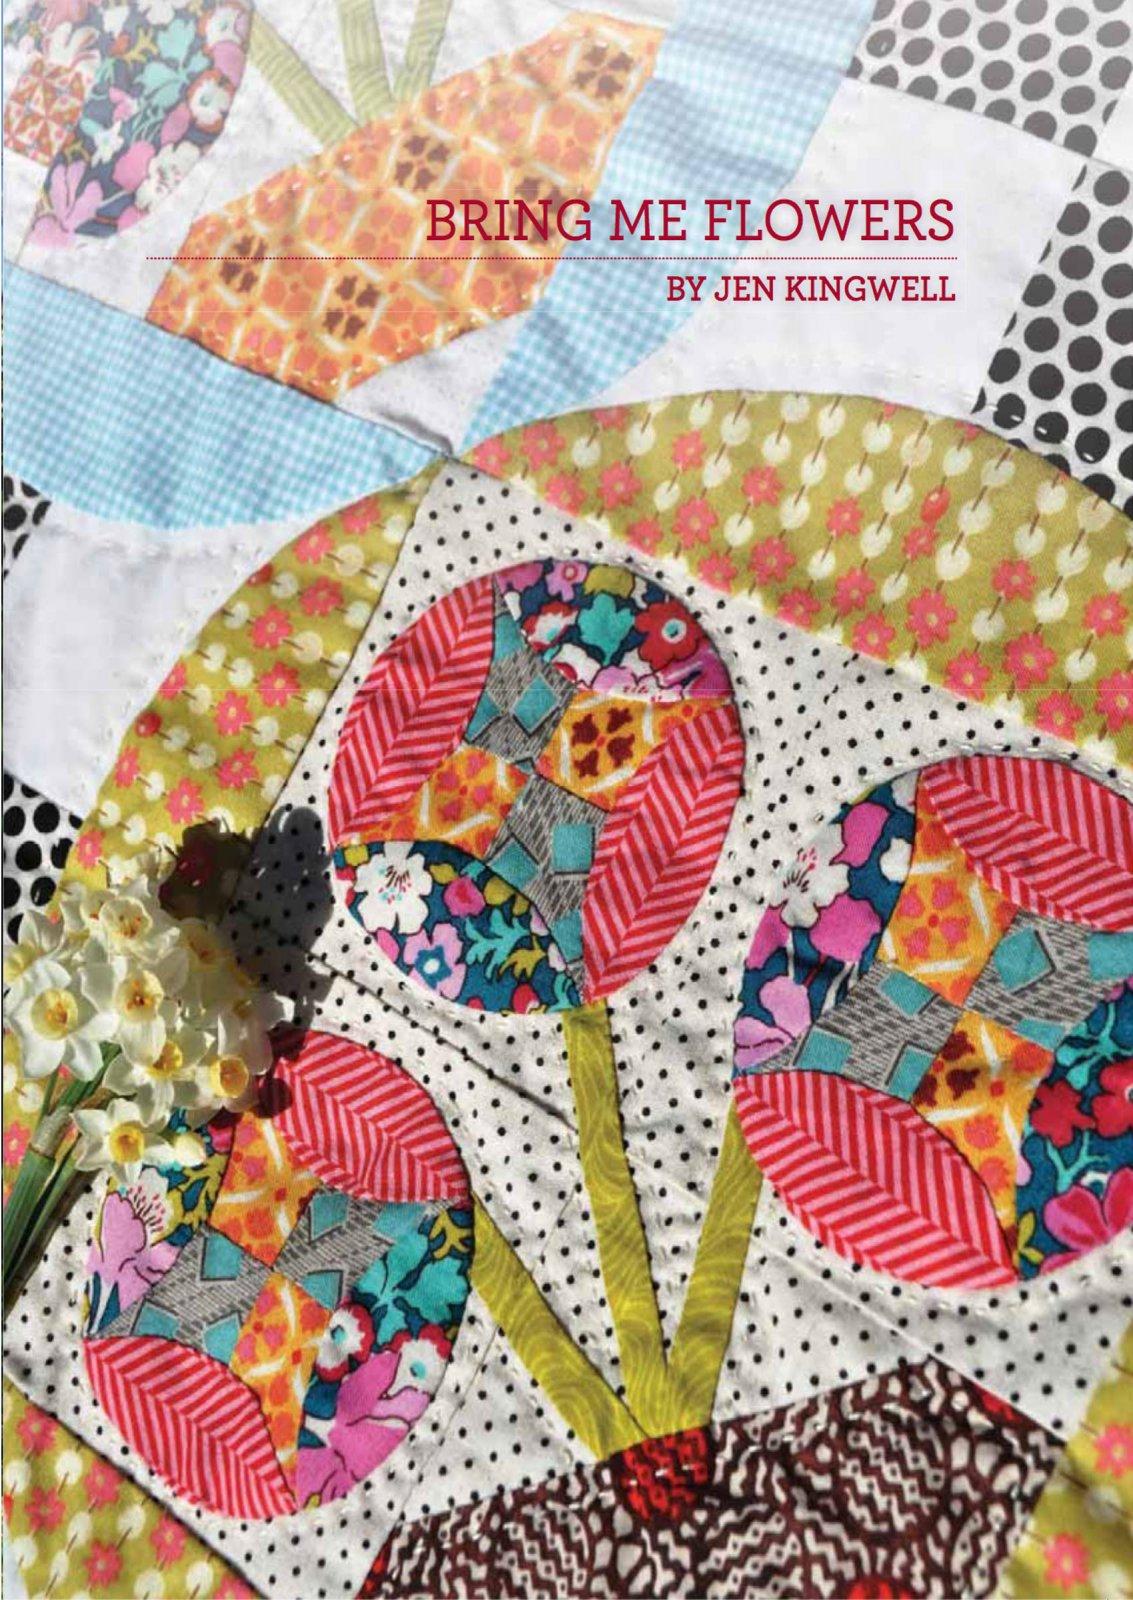 Bring Me Flowers Booklet by Jen Kingwell